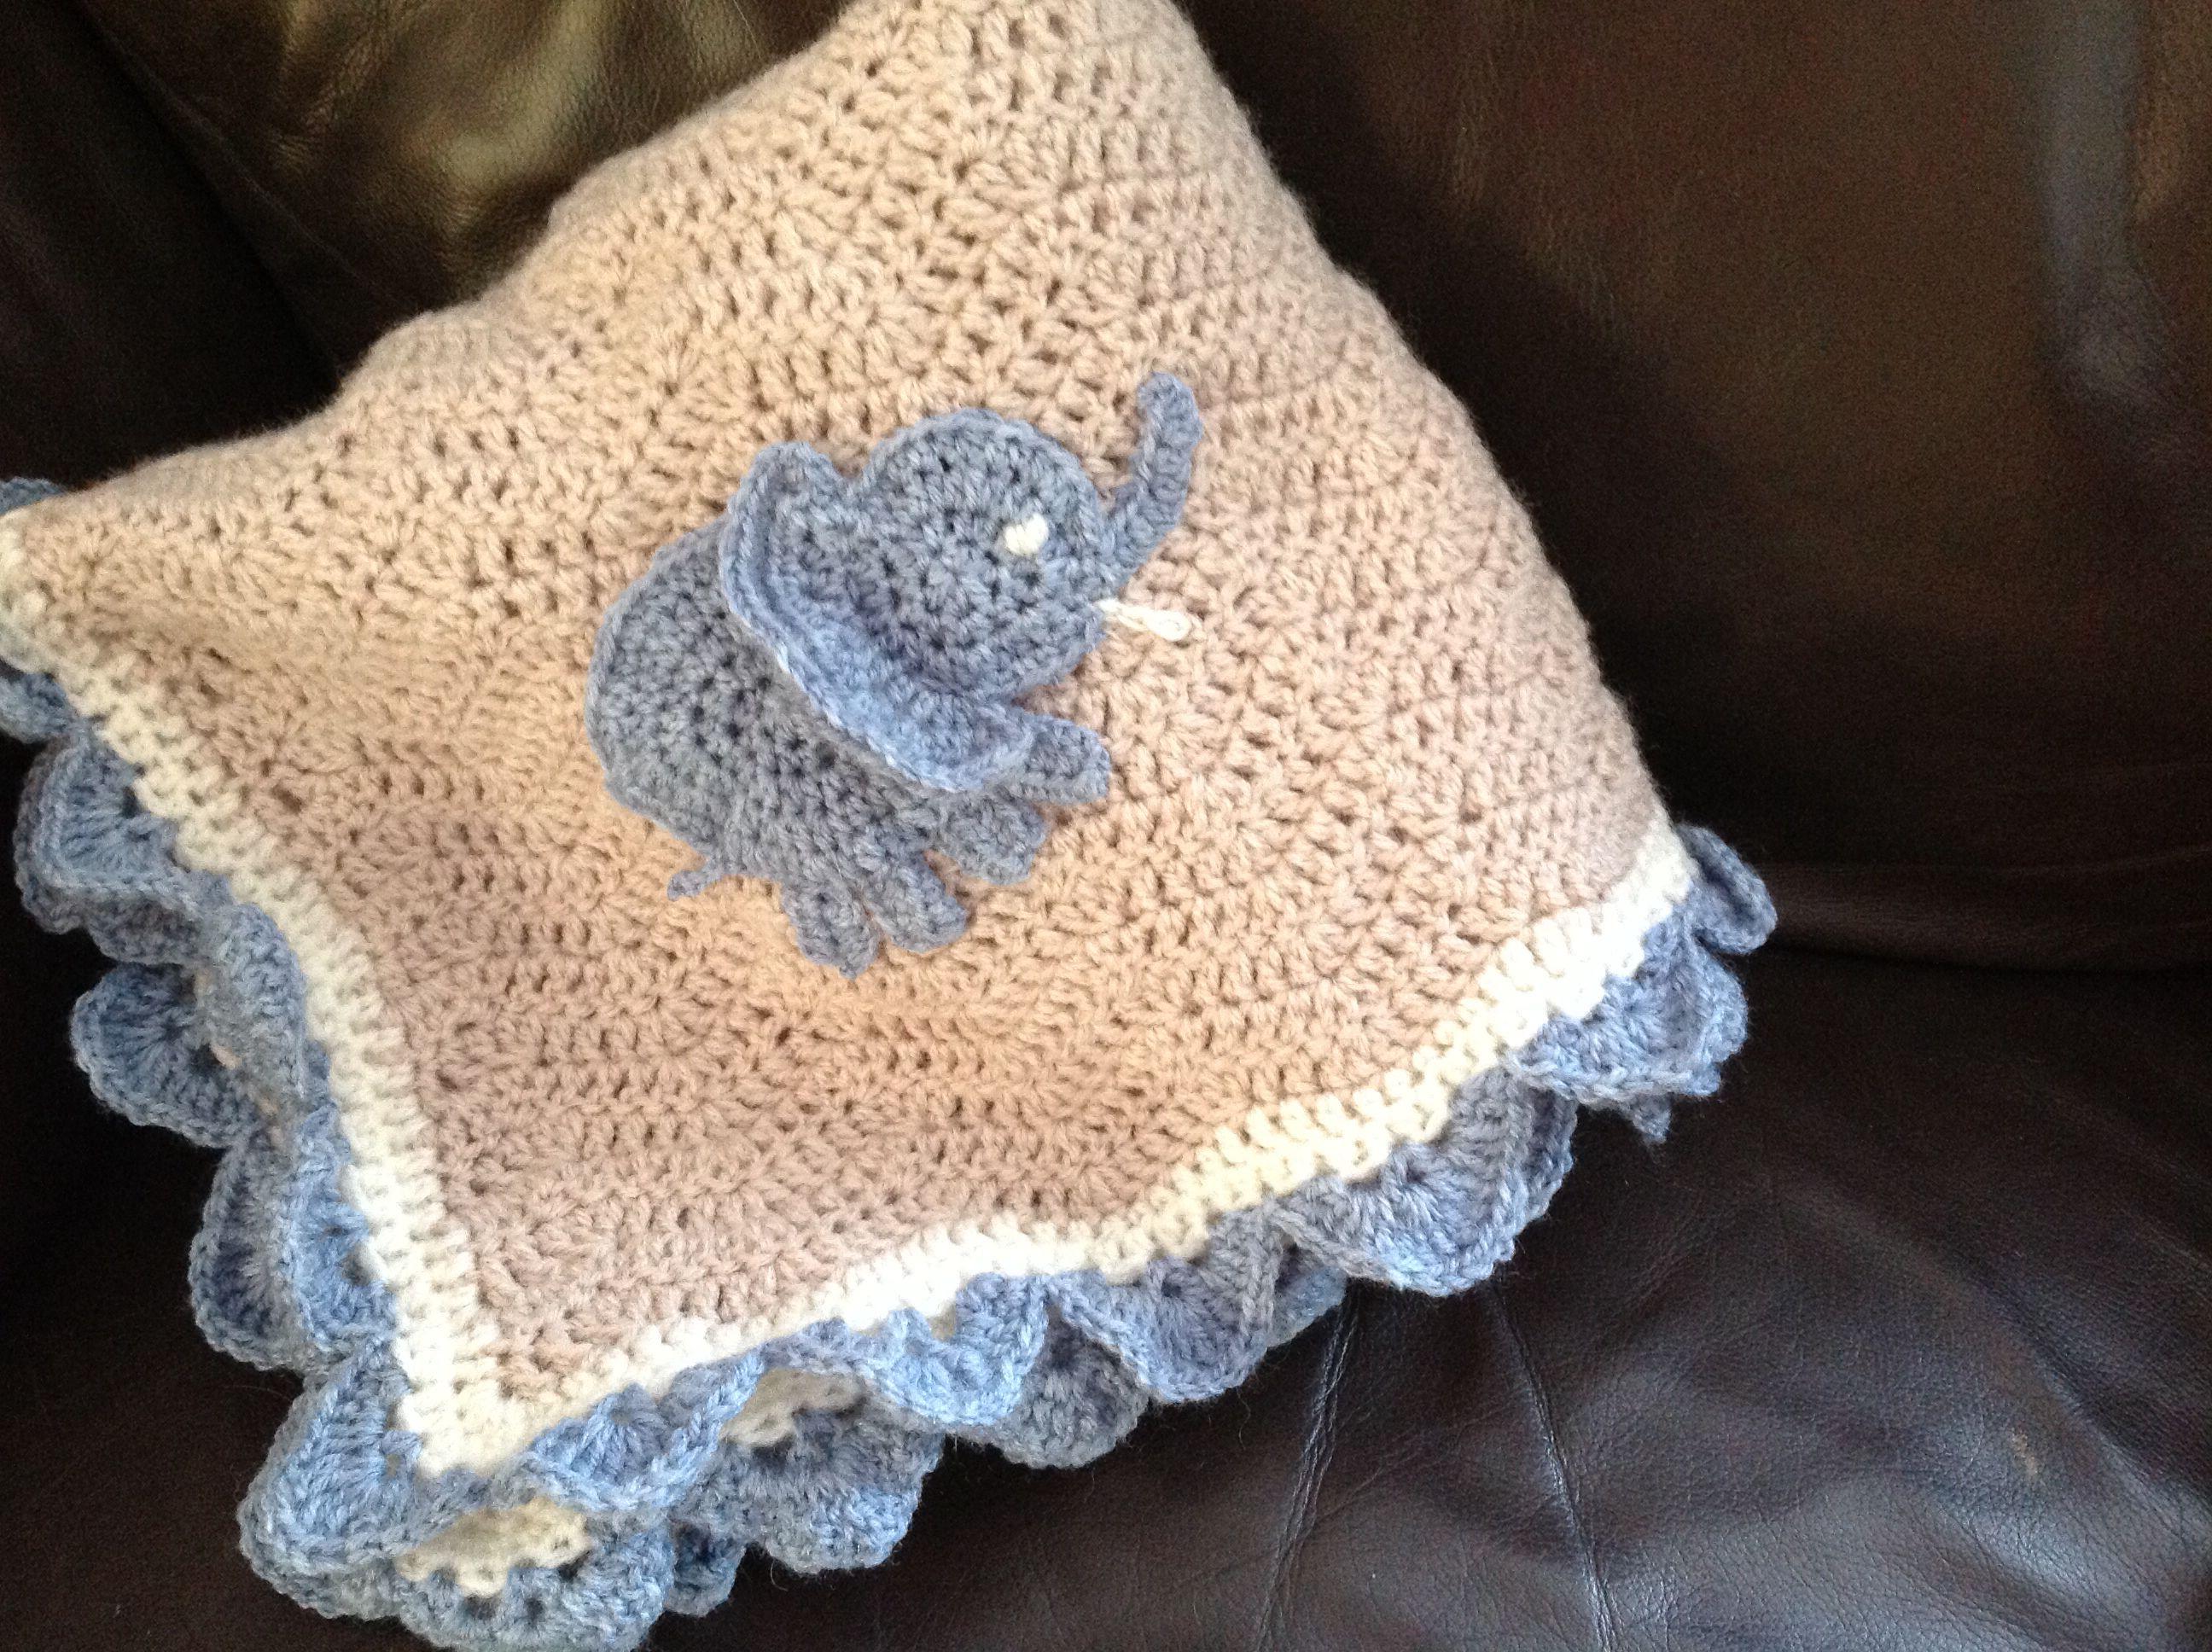 Crochet Elephant Blanket : Cute Elephant crochet baby blanket x Crochet Pinterest